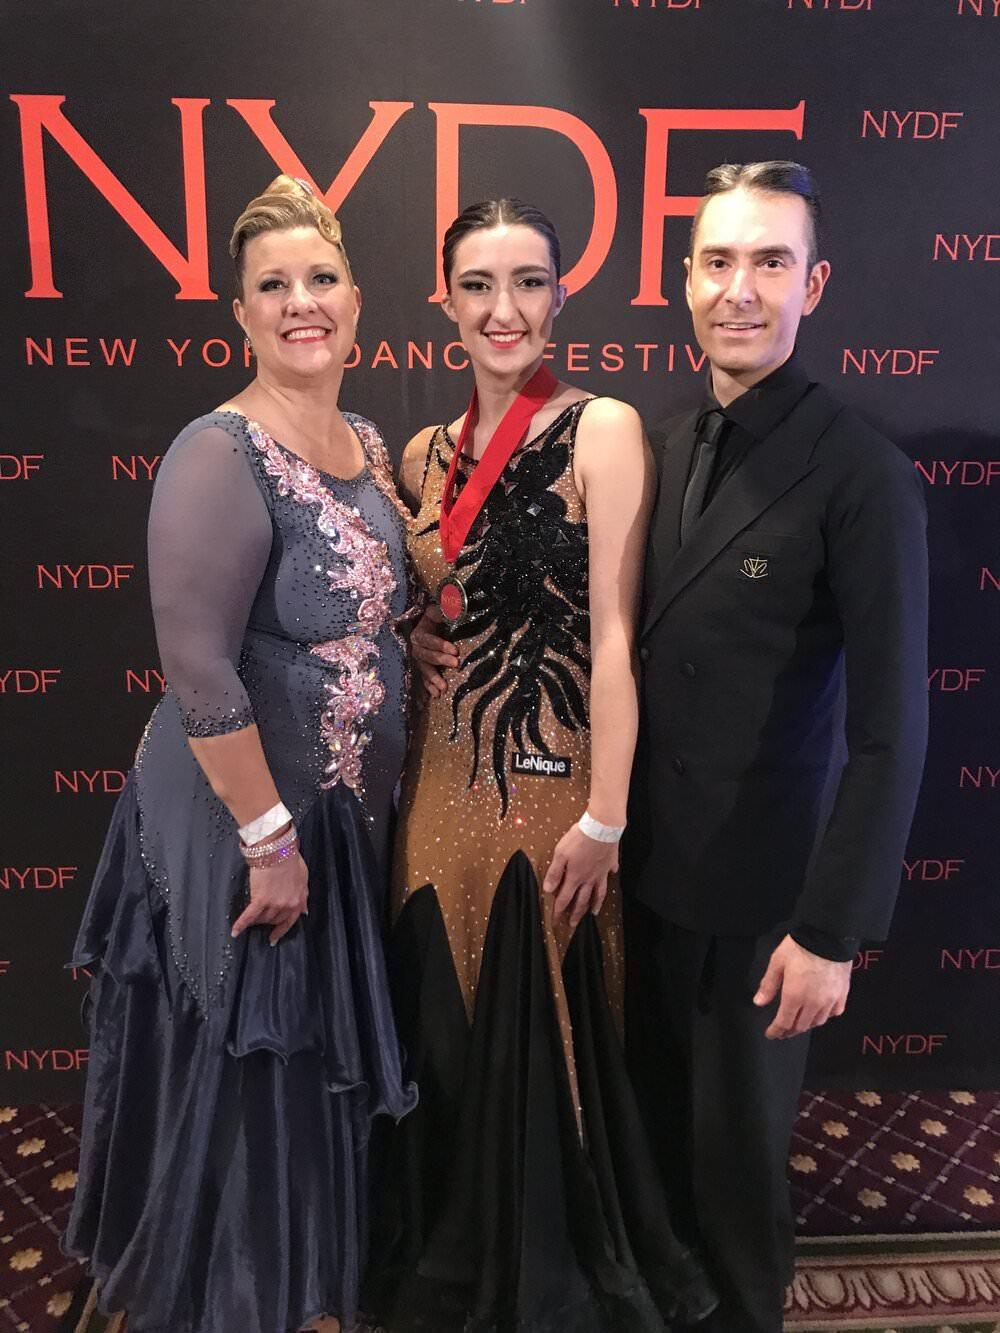 Atanas Malamov with students at New York Dance Festival